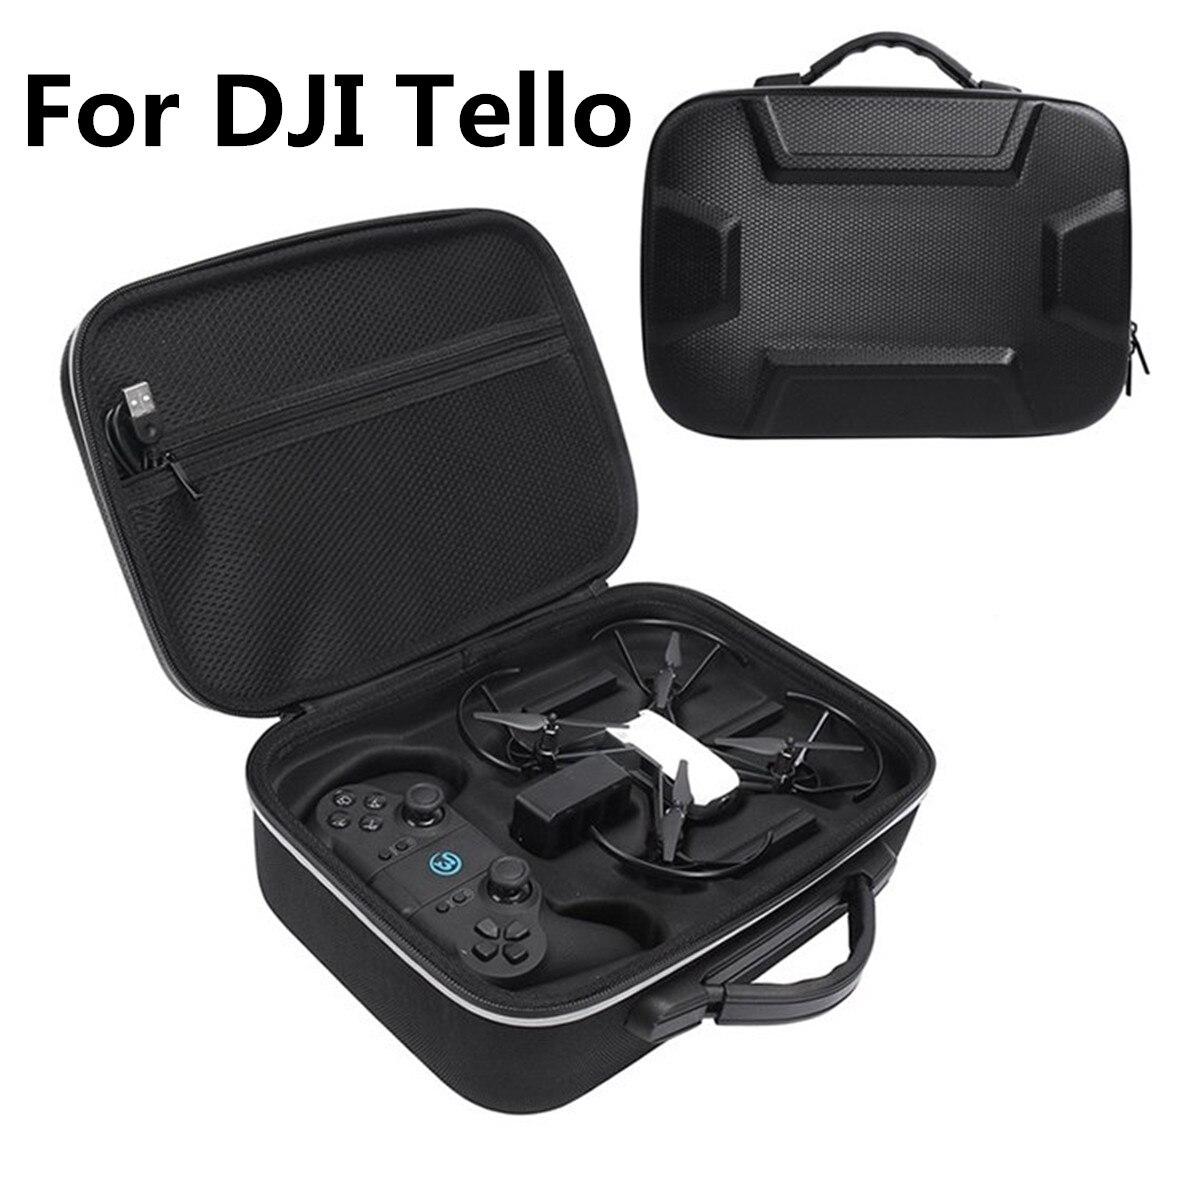 Waterproof Travel PU EVA Carry Bag For DJI Tello EDU Protective Storage Case For DJI Tello Drone Portable Handbag Box Black